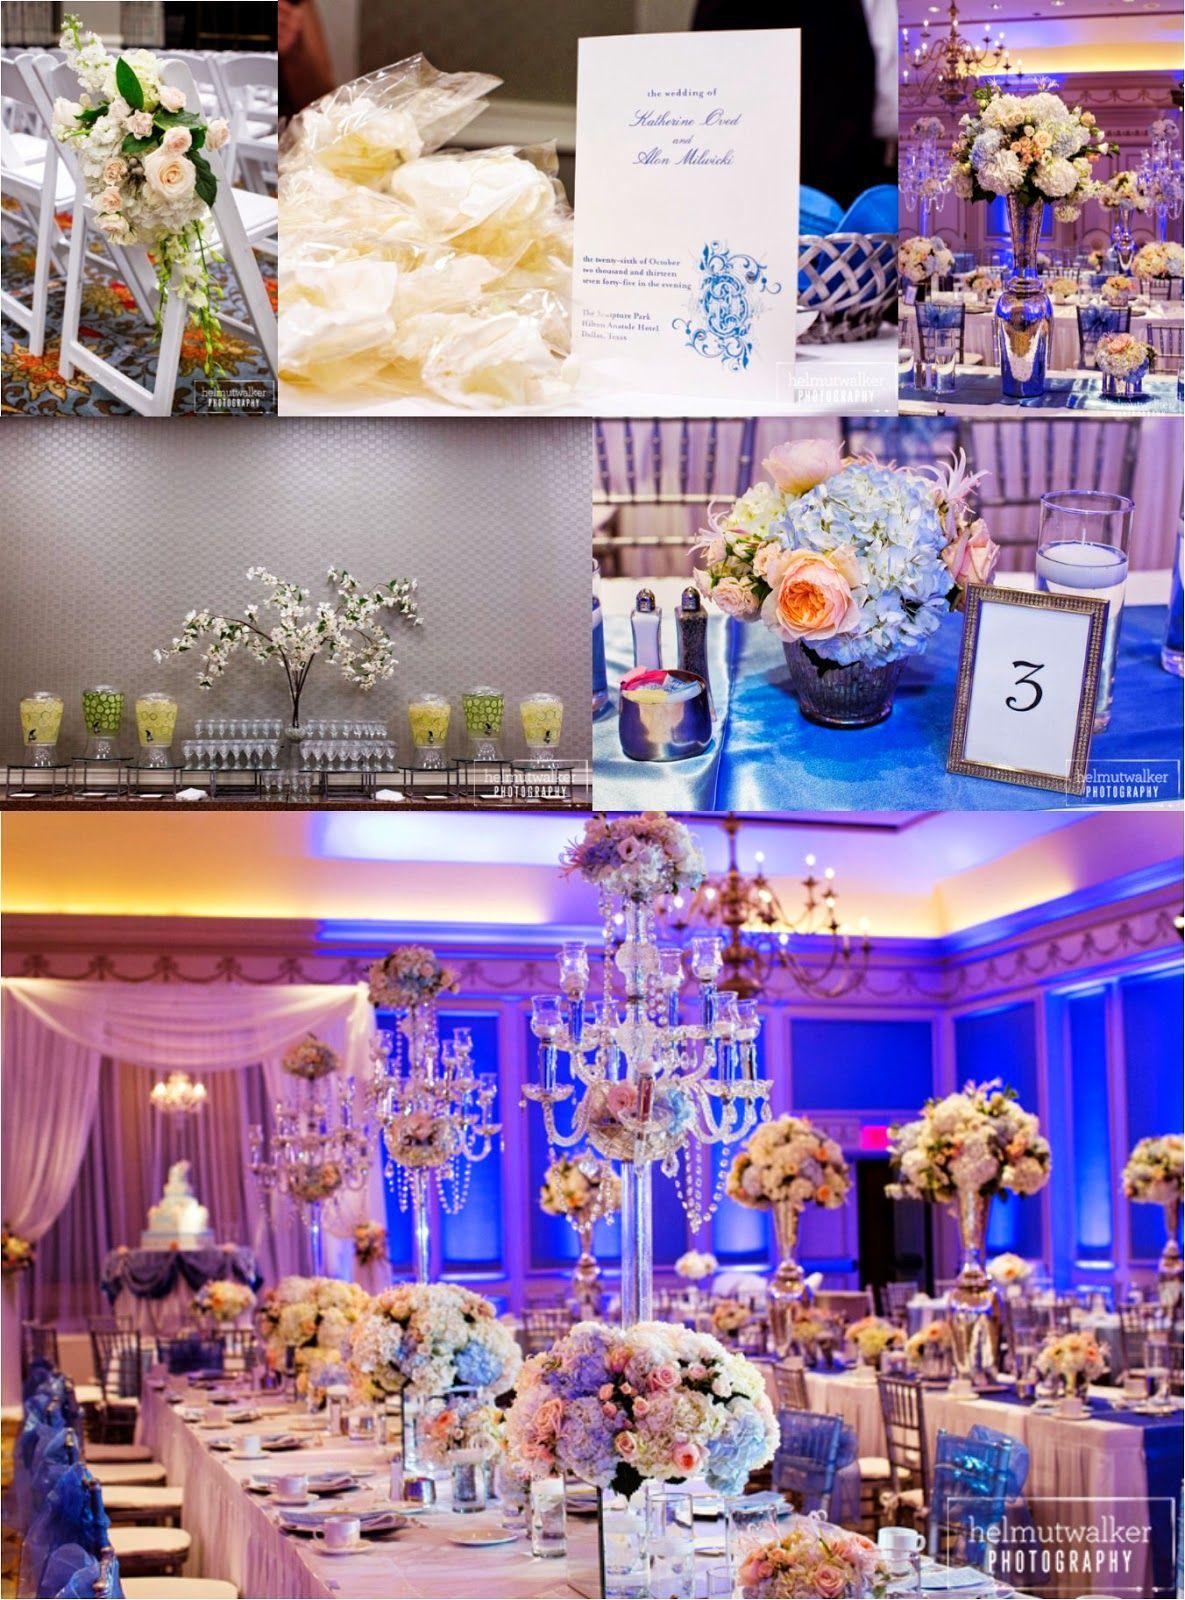 Purple and blue wedding decor  Real Wedding OvedMilwicki  Weddings by StarDust  Pinterest